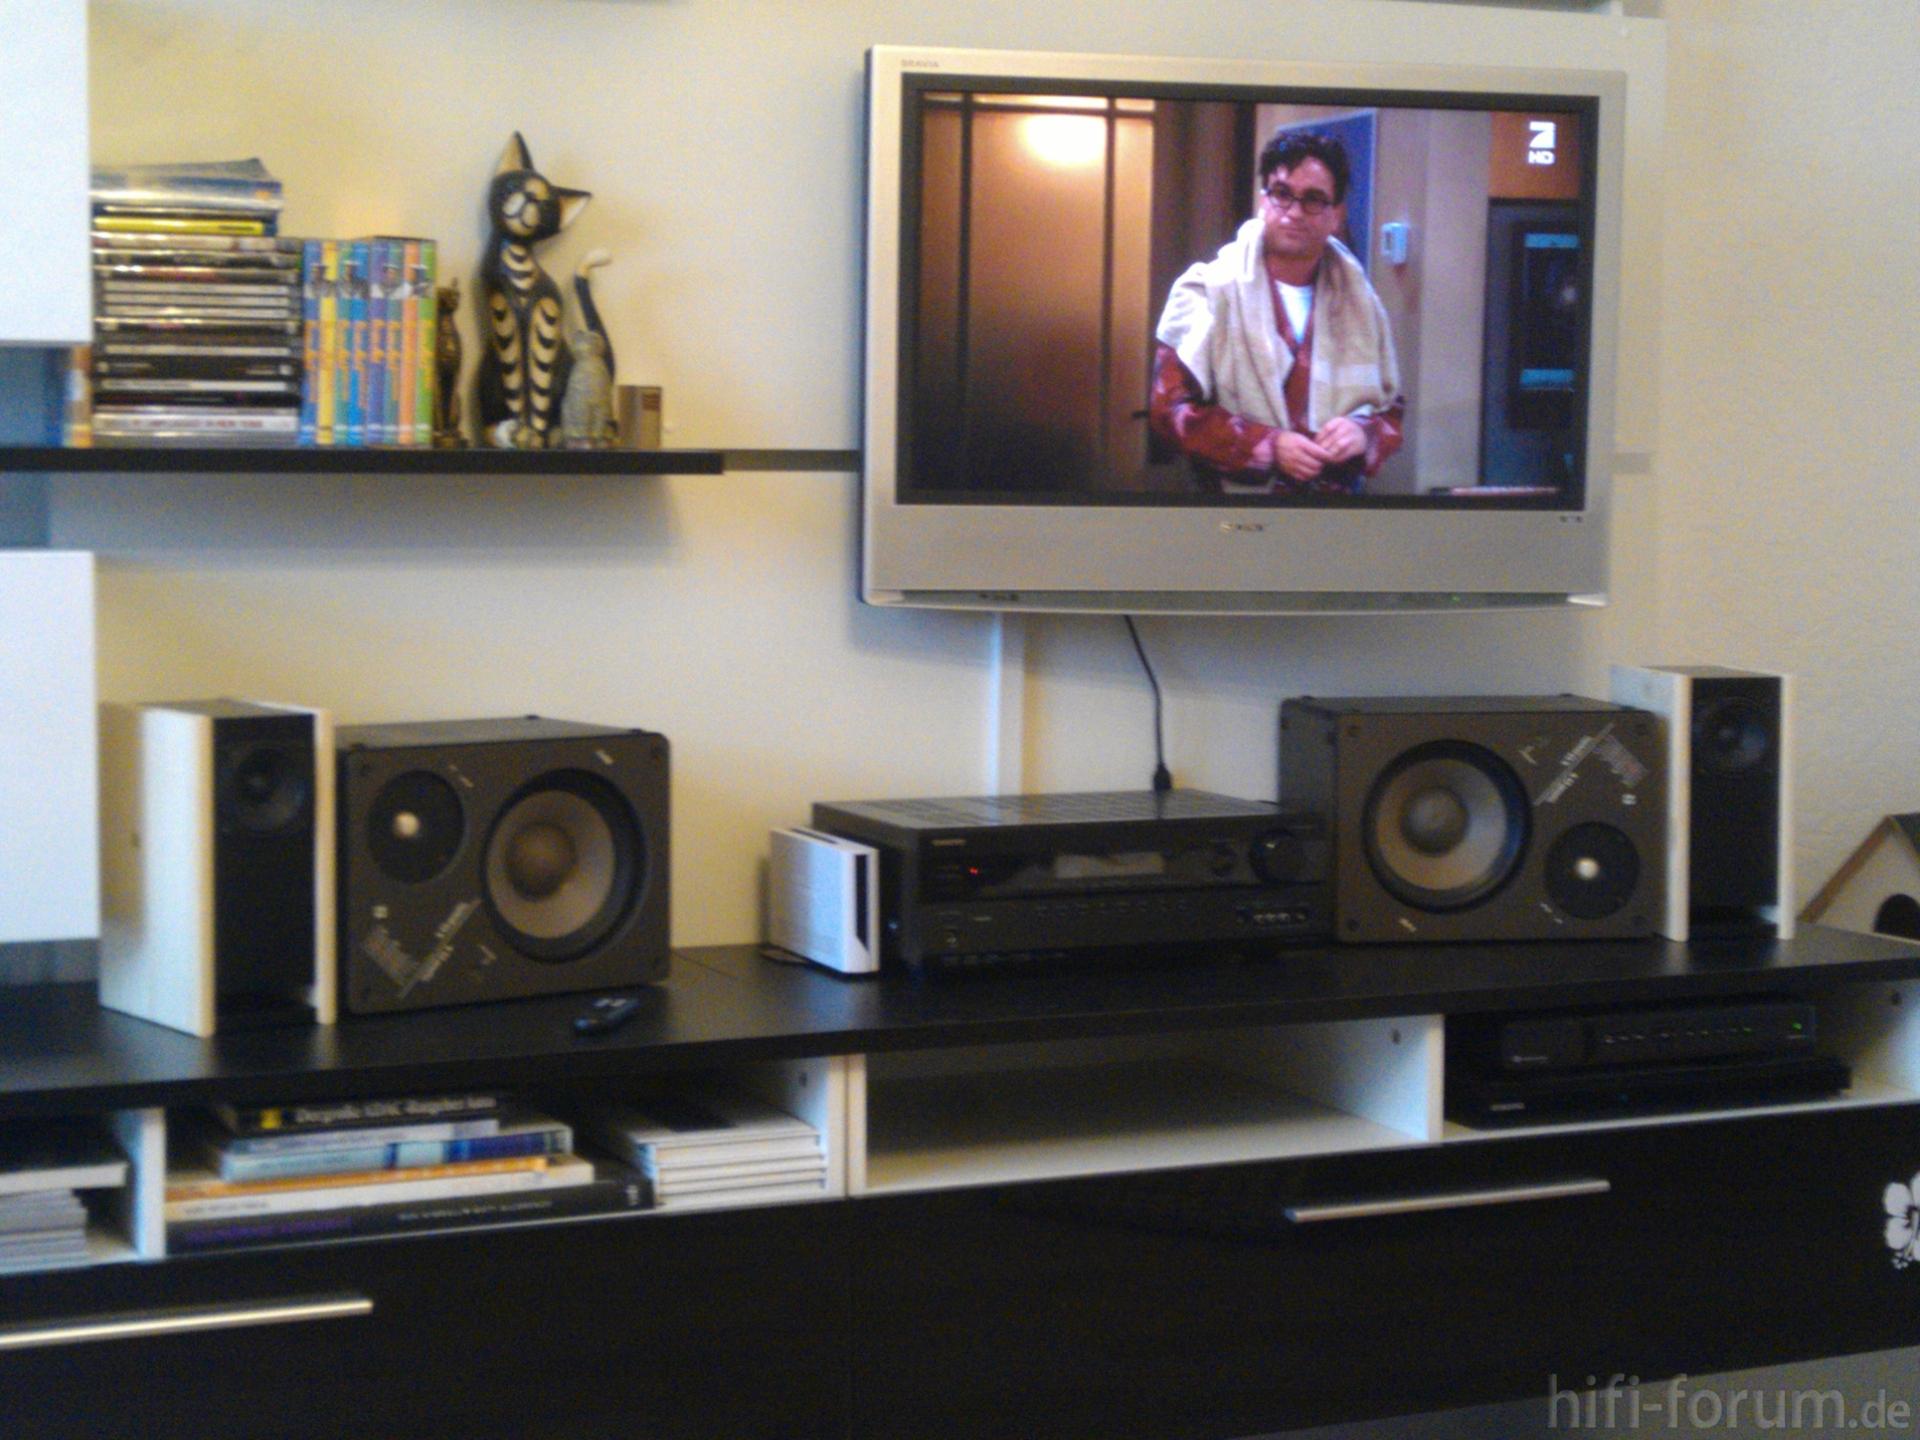 tv wand tv tvwand wand hififorumde bildergalerie. Black Bedroom Furniture Sets. Home Design Ideas